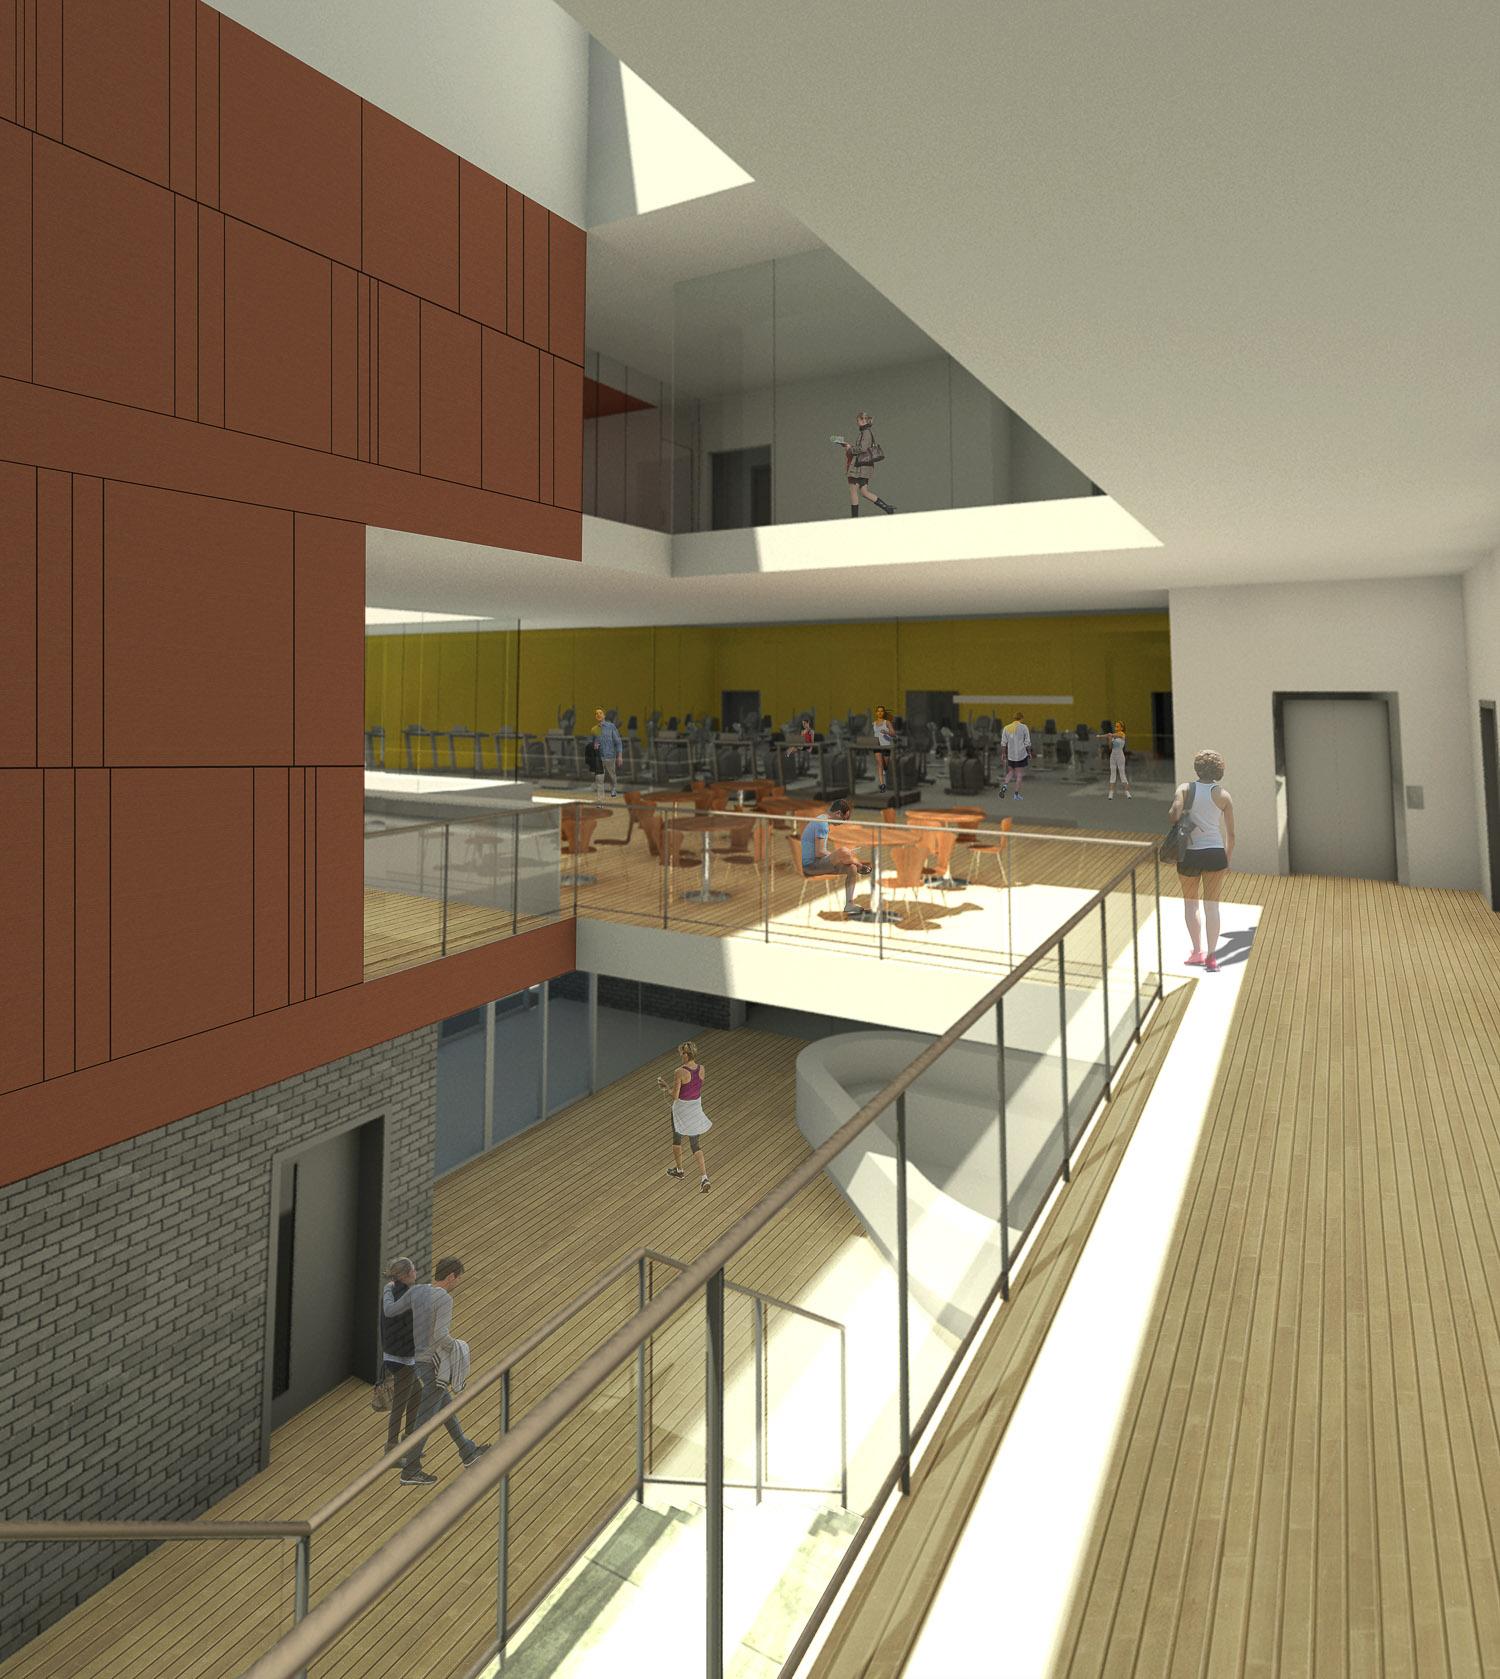 Dundee Academy of Sport